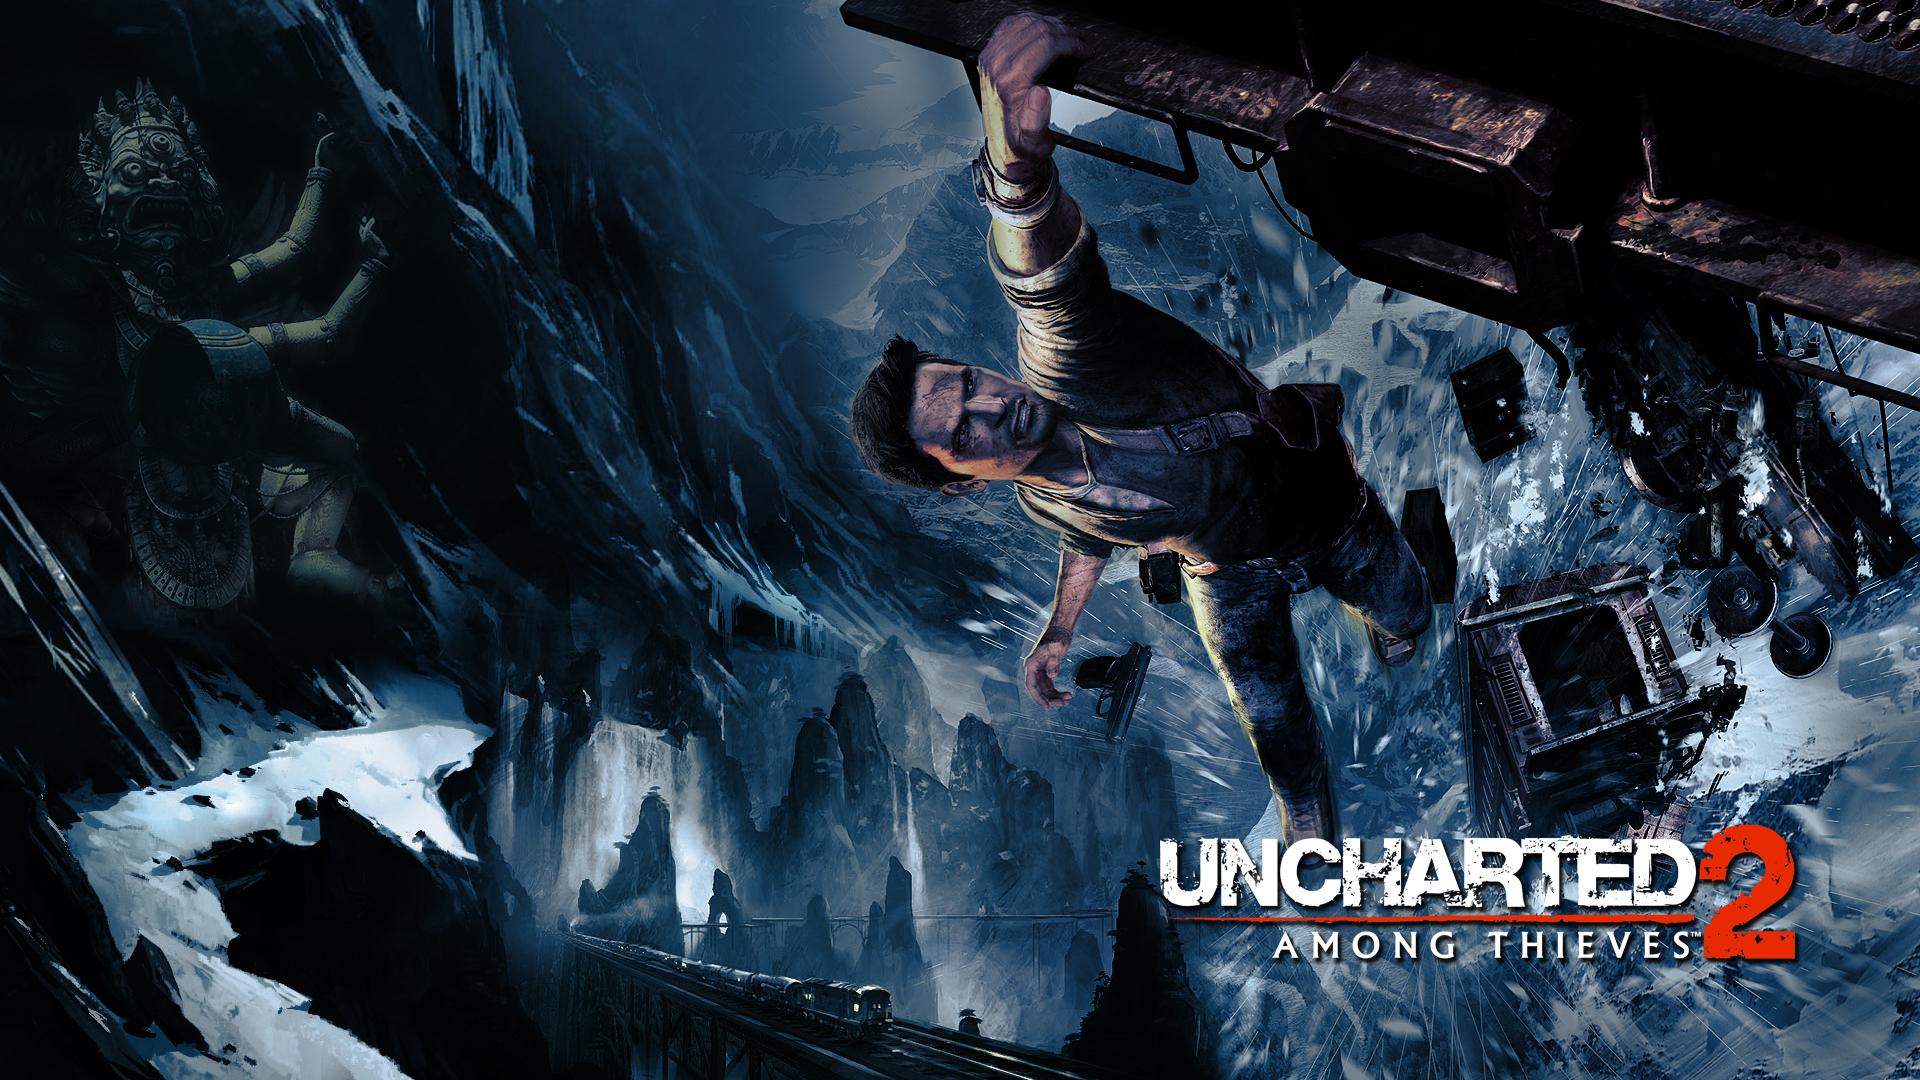 Uncharted 2 El Reino de los Ladrones WallPapers Uncharted 1920x1080